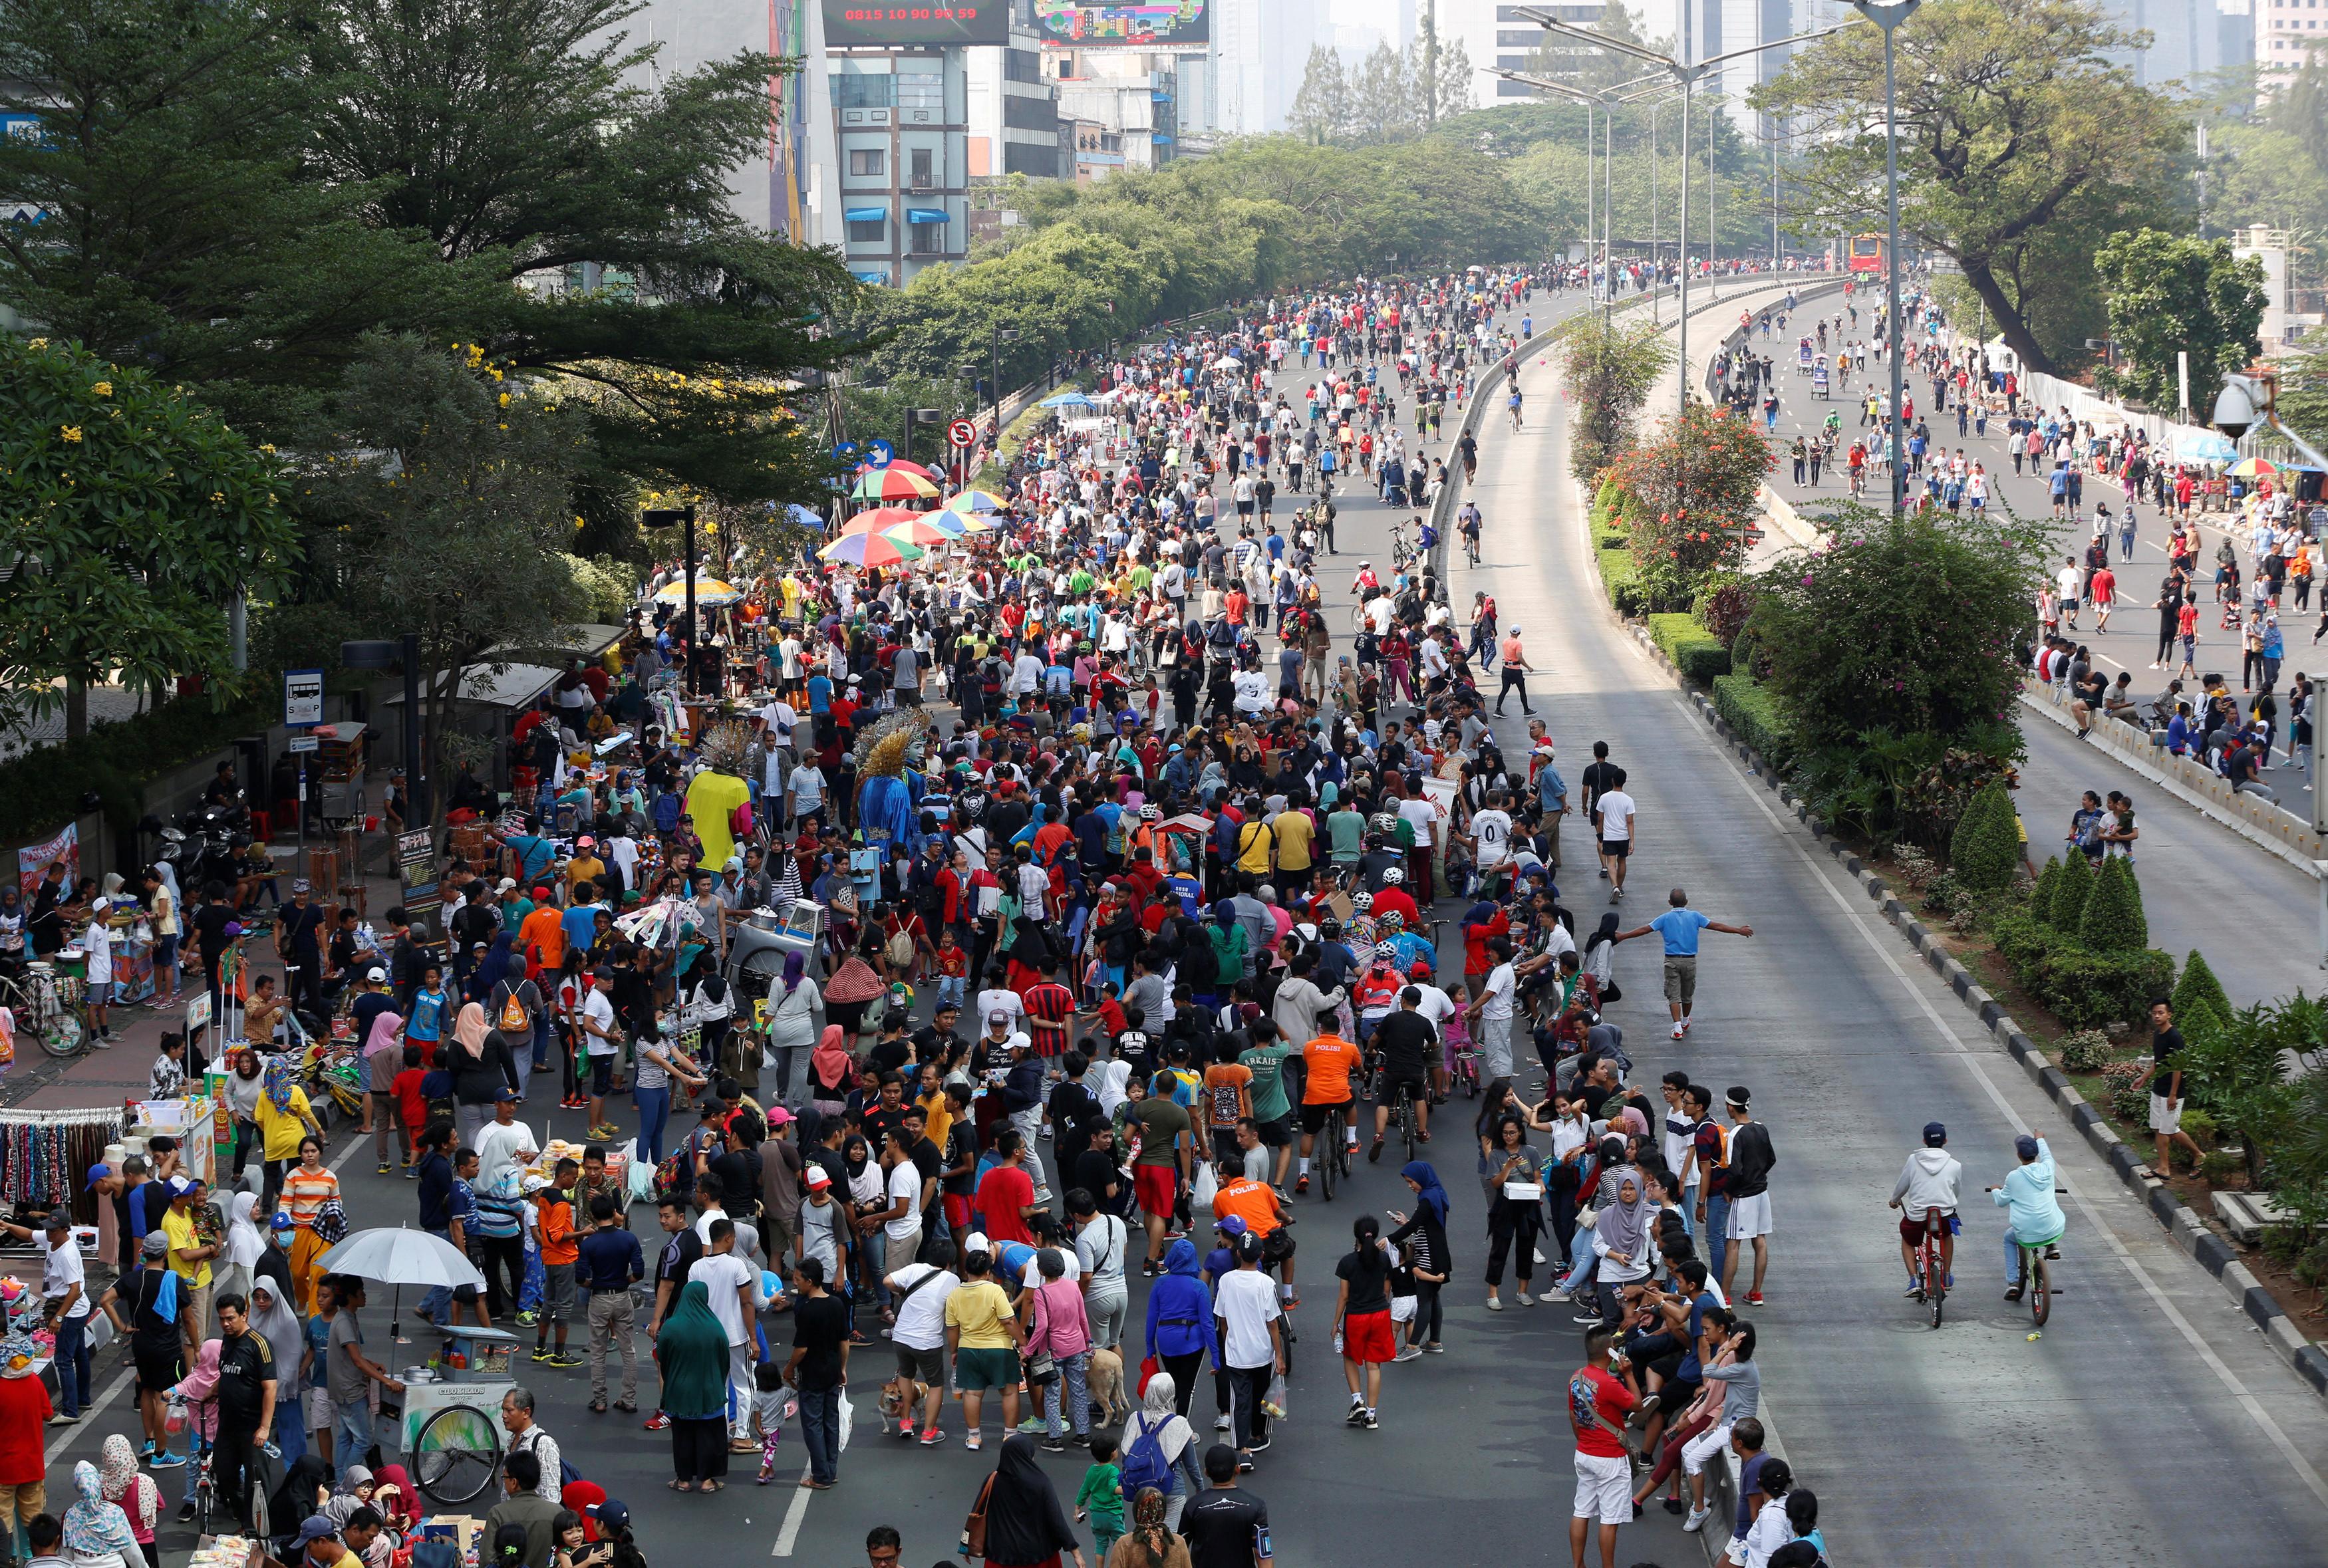 people walk in cities